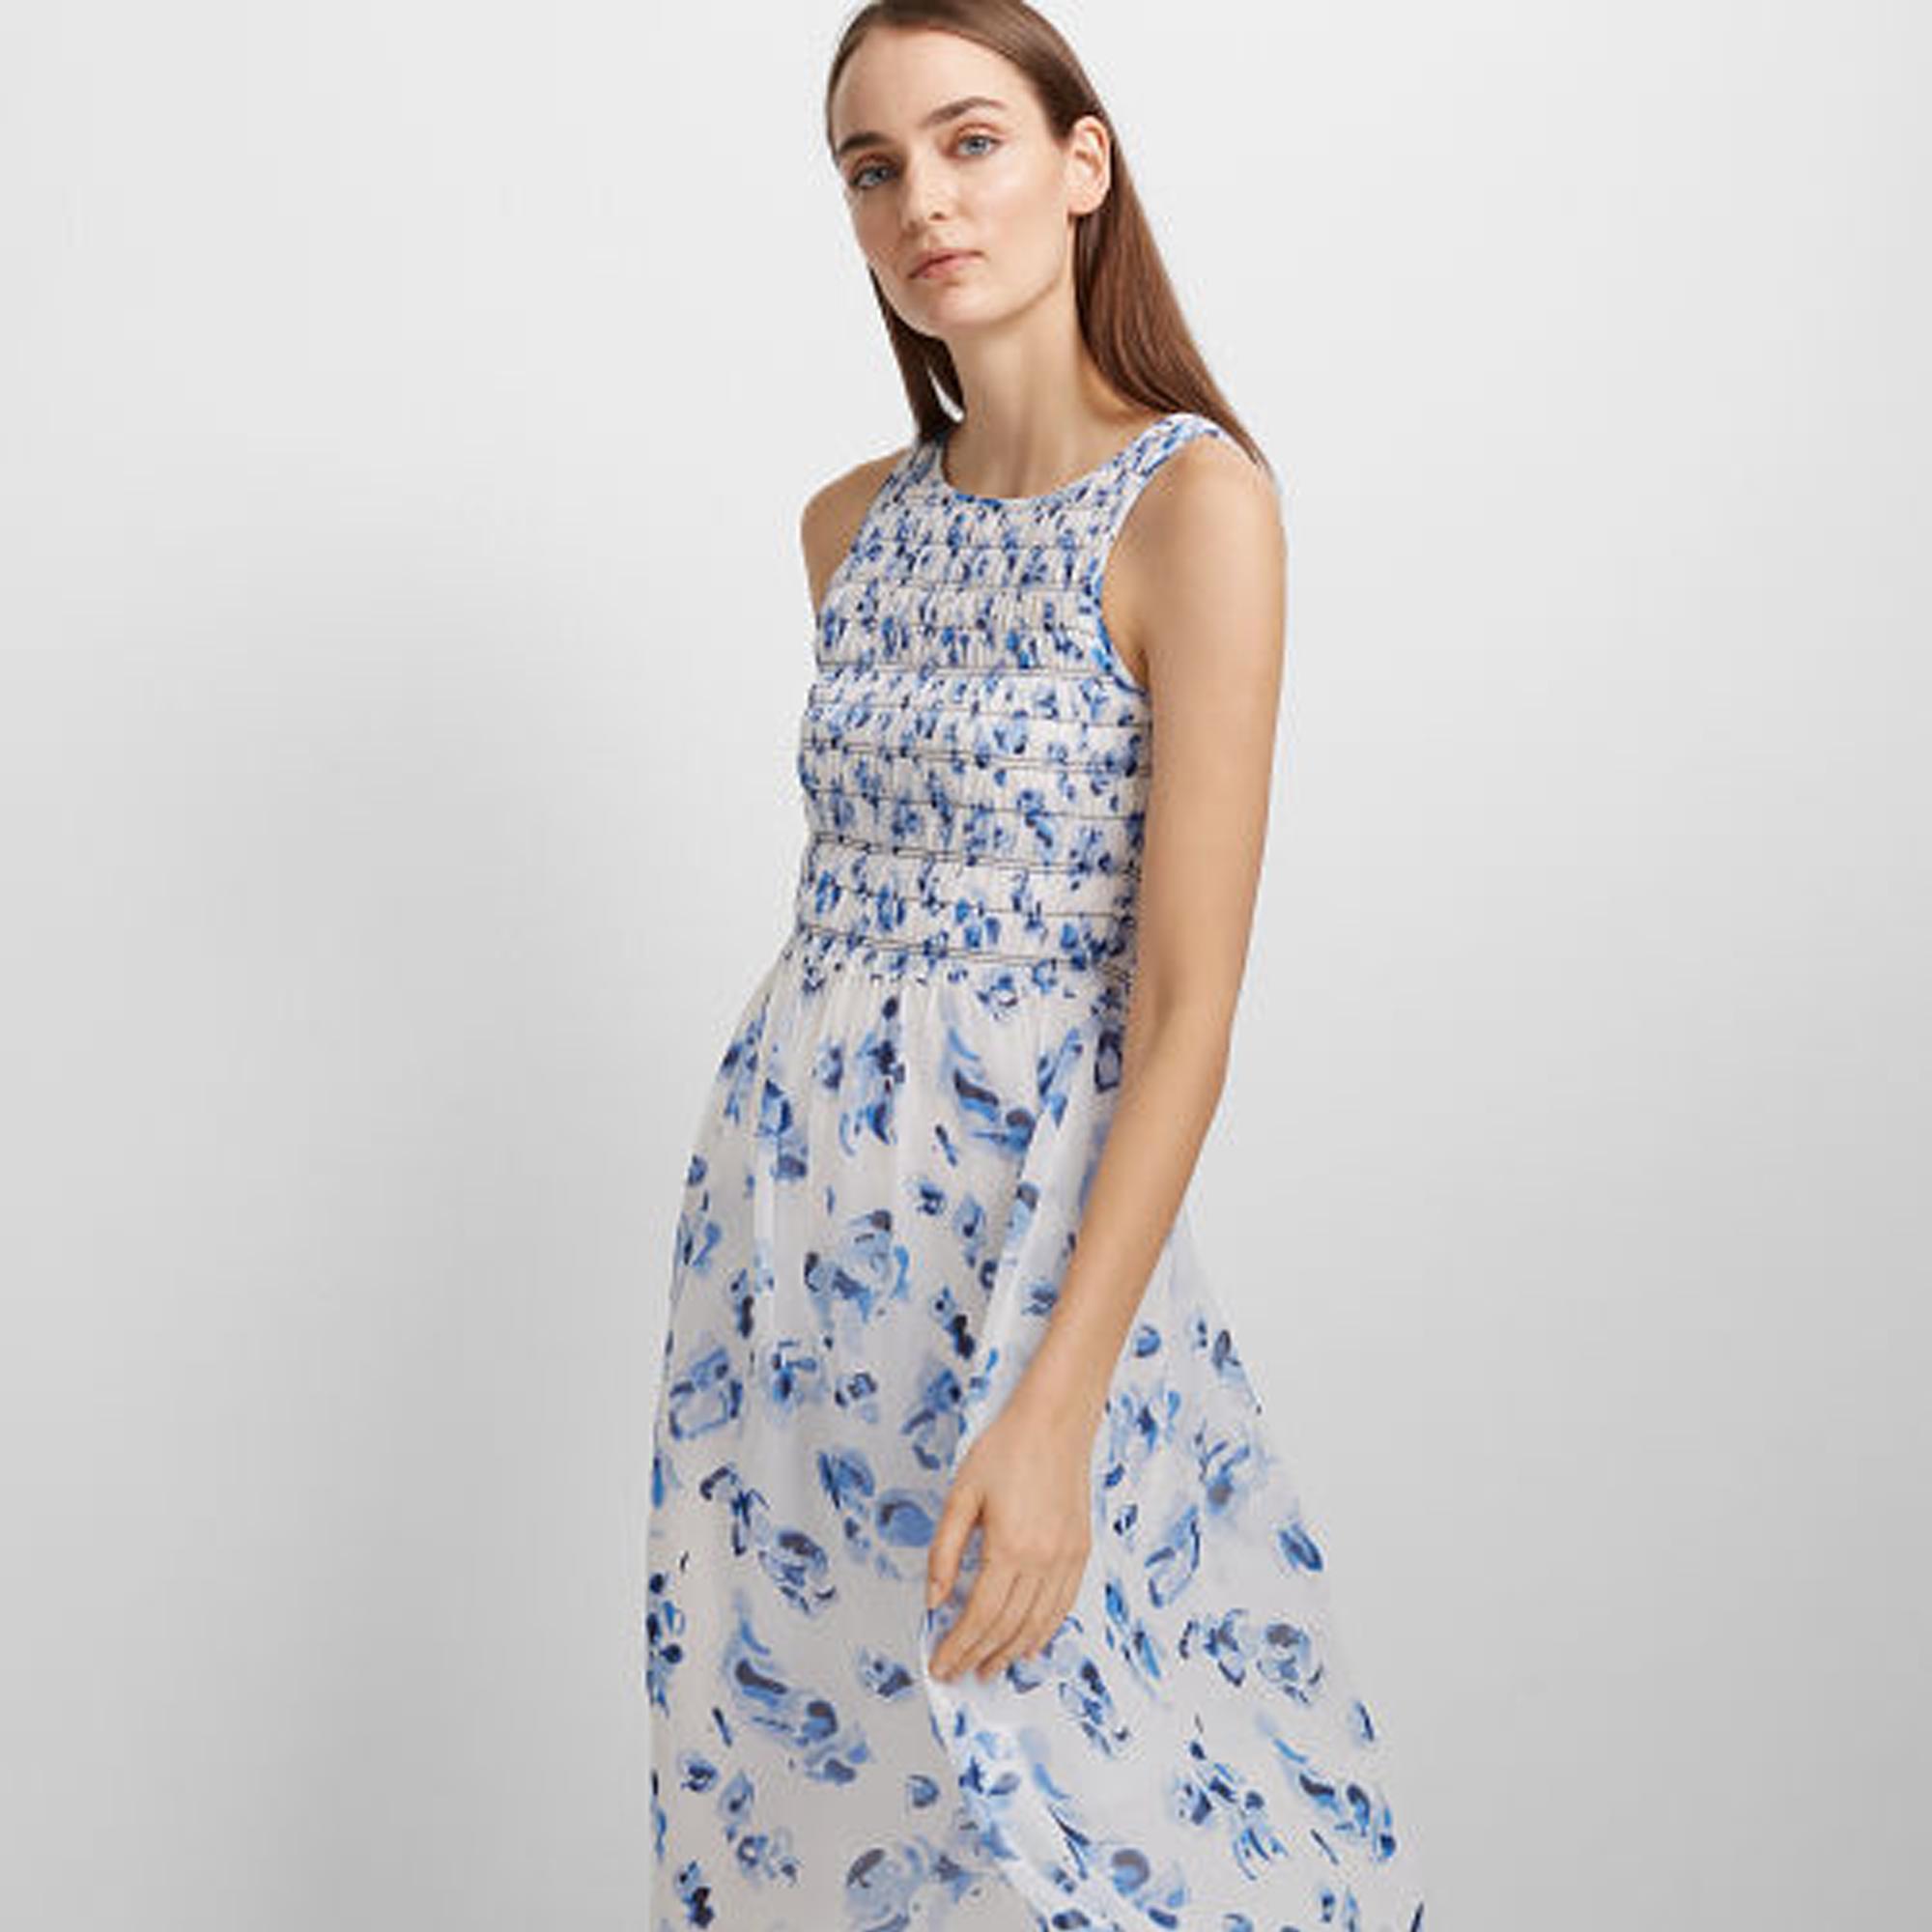 Feleenie Silk Dress   HK$2,690